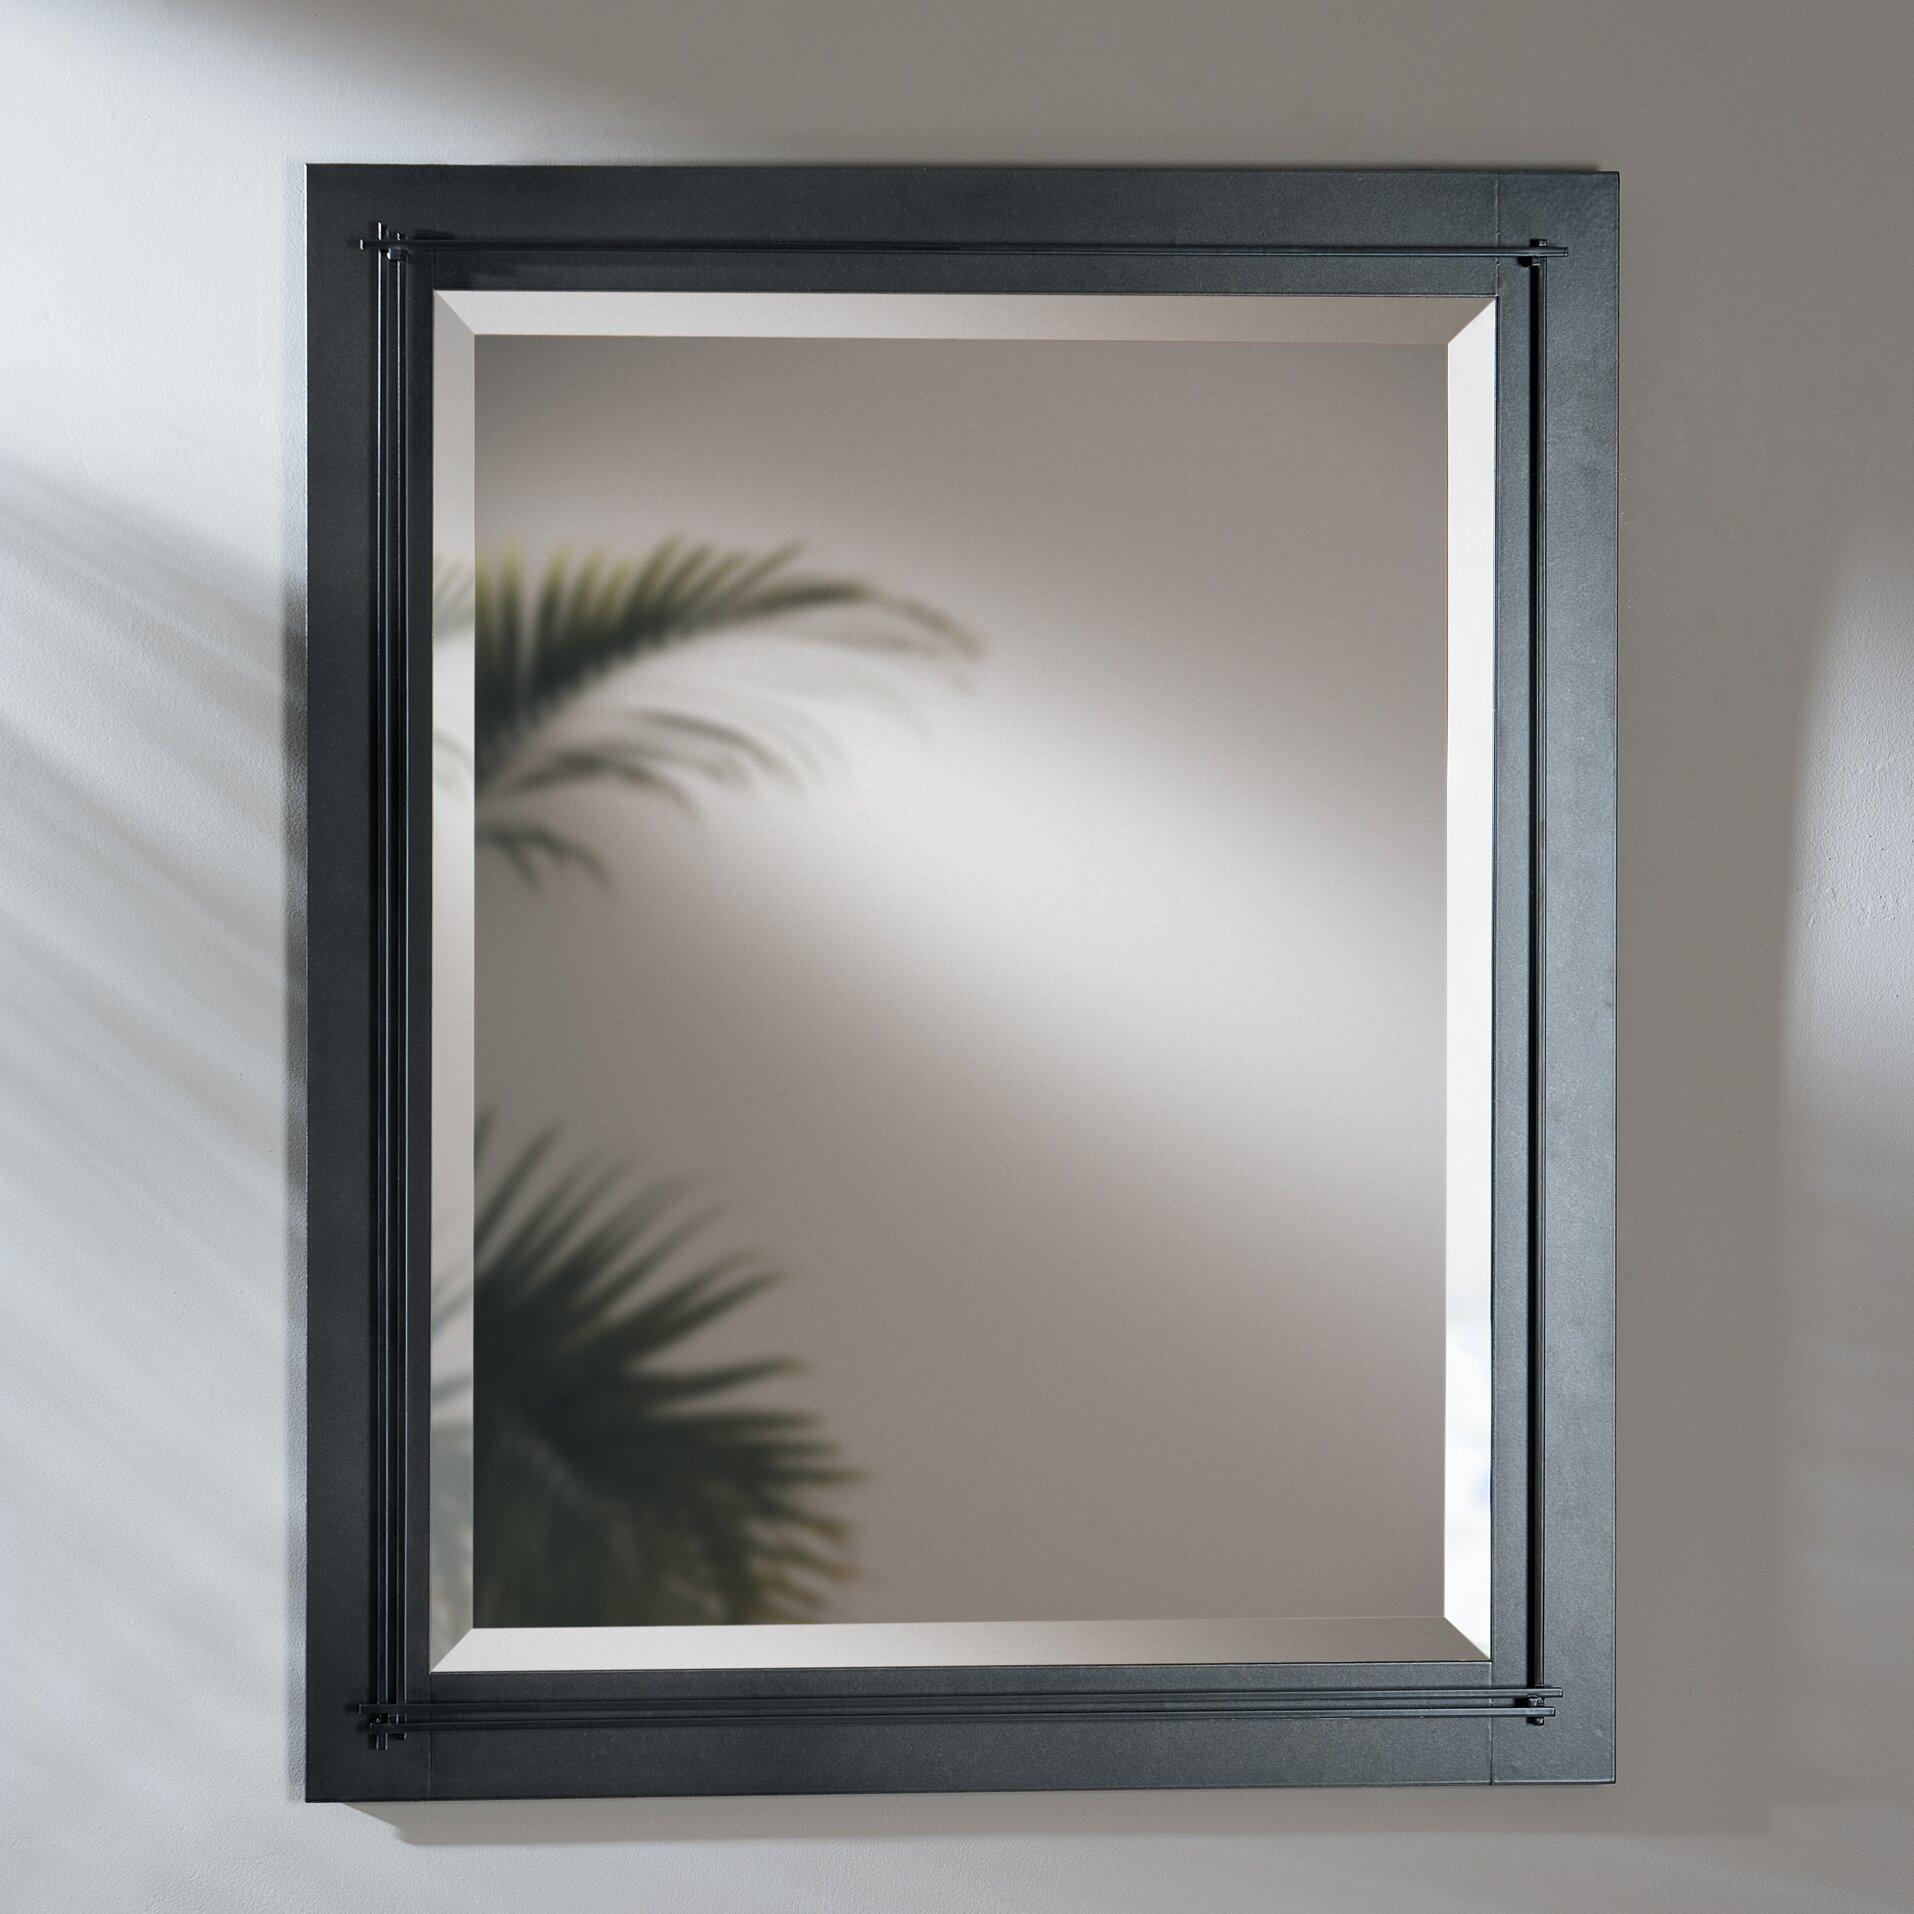 Hubbardton Forge Metra Modern And Contemporary Beveled Bathroom Vanity Mirror Wayfair